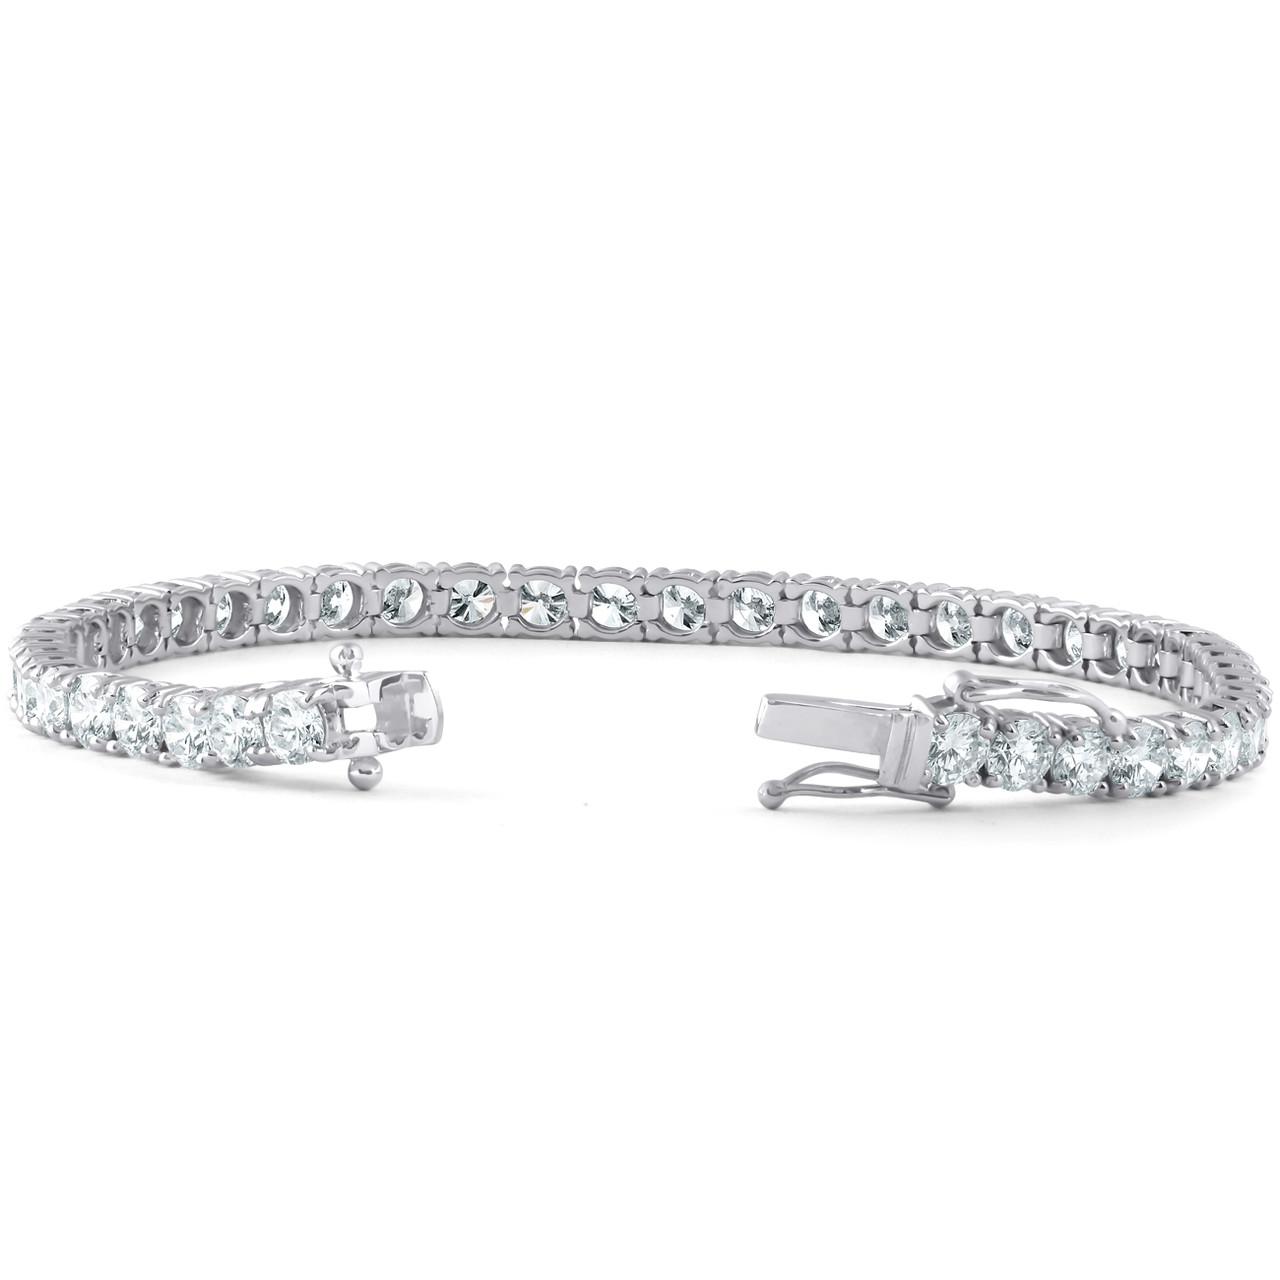 ded77505003 10 Ct Diamond Tennis Bracelet 18k White Gold Lab Grown Eco Friendly (H